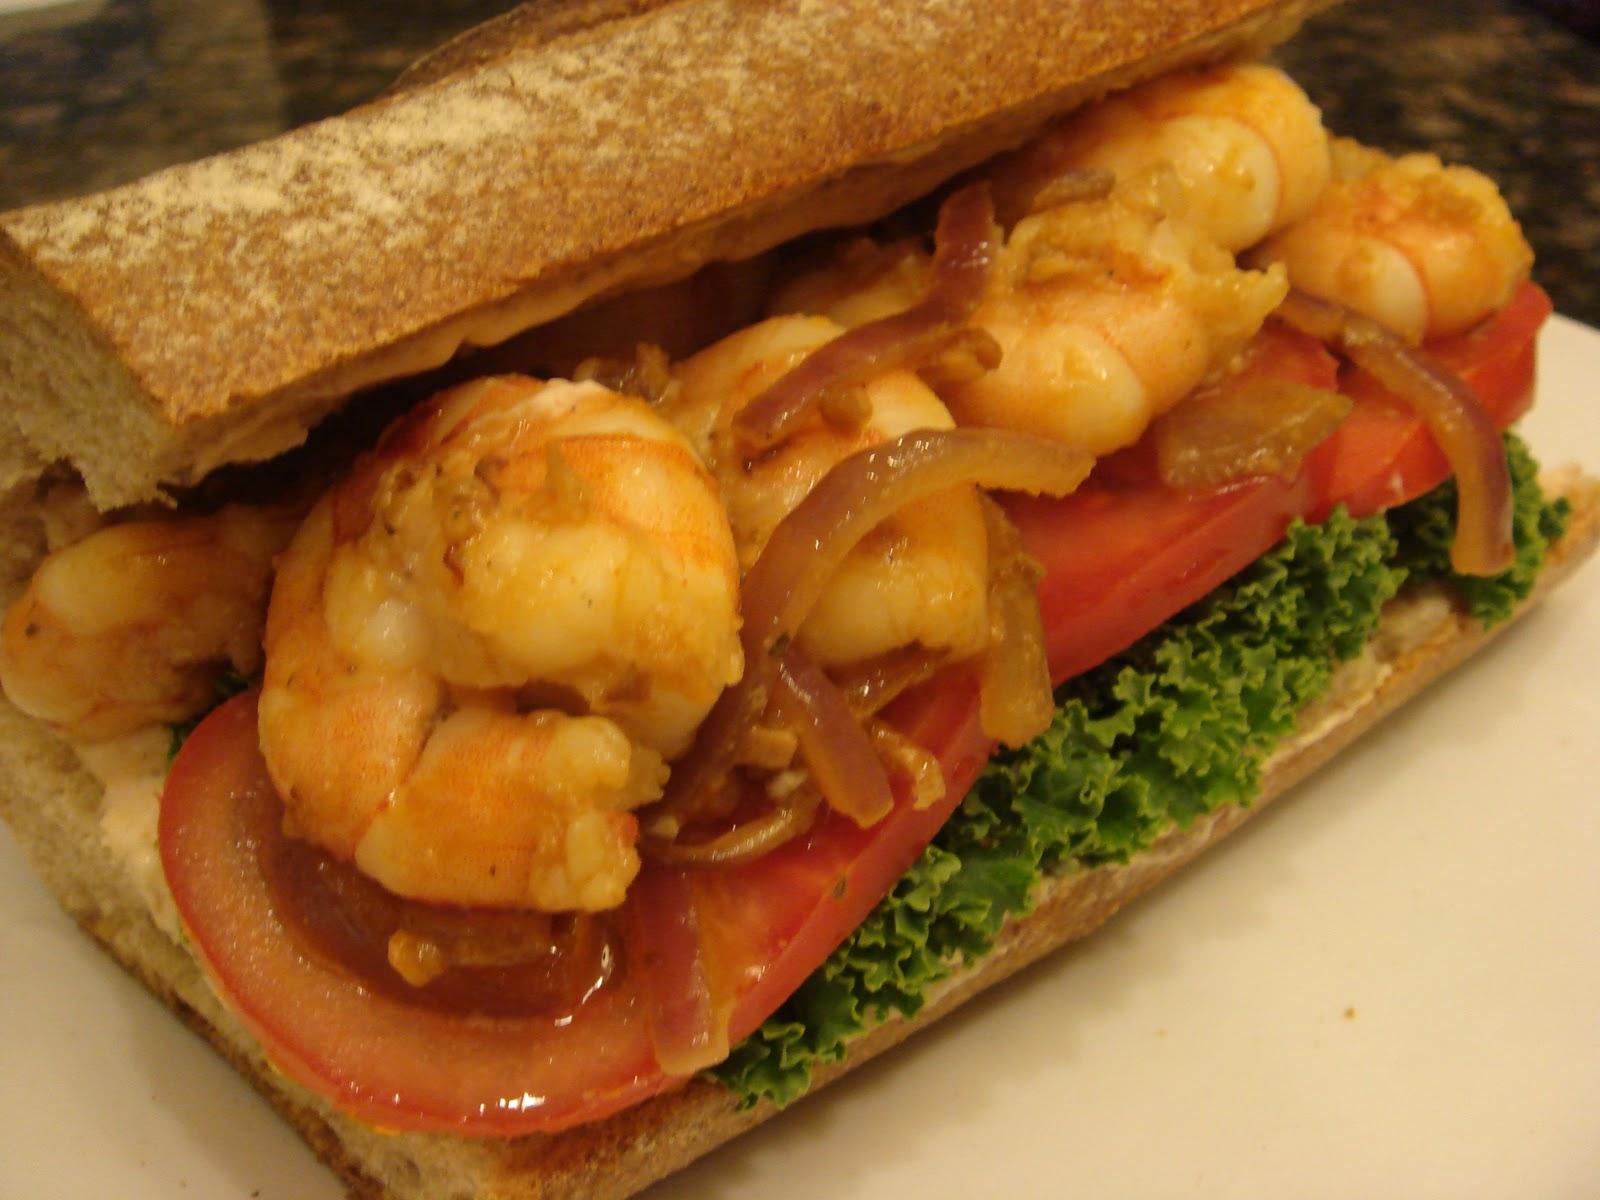 ... salmon with avocado remoulade shrimp po boy w spicy remoulade sauce